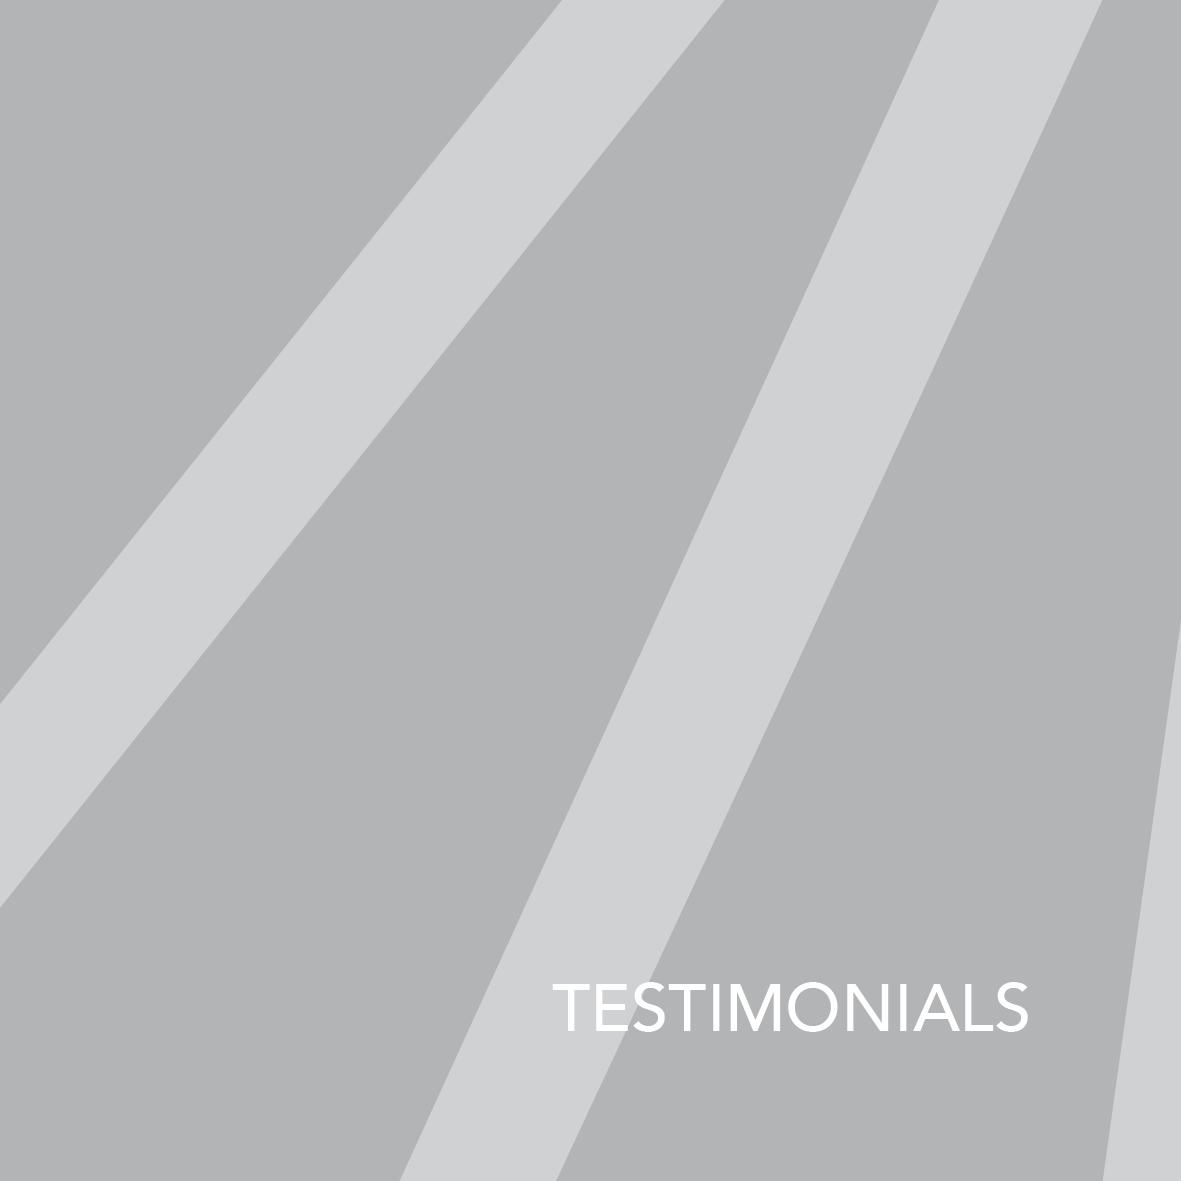 Jamie Lumsden life coach testimonials